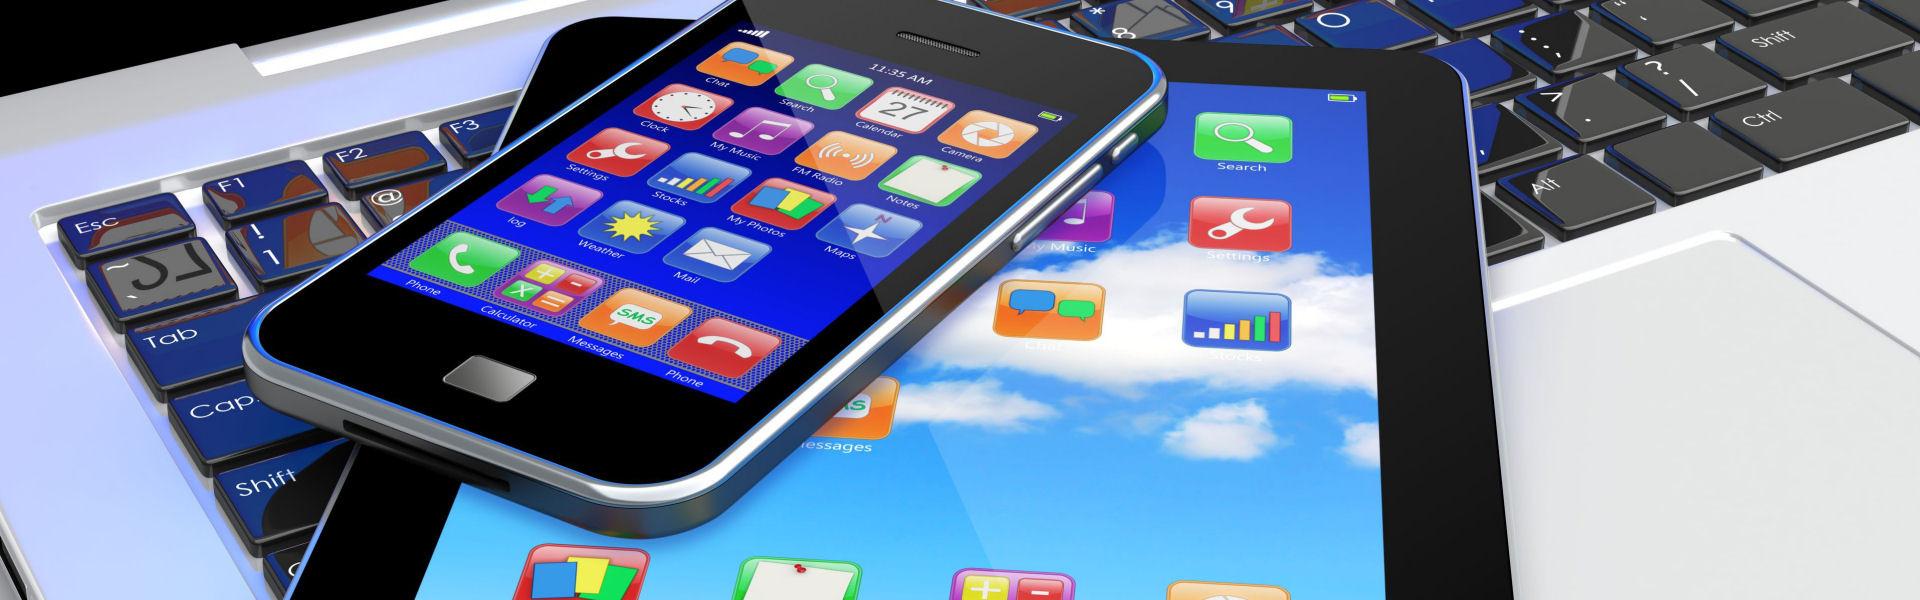 Mobile Apps Slider 001